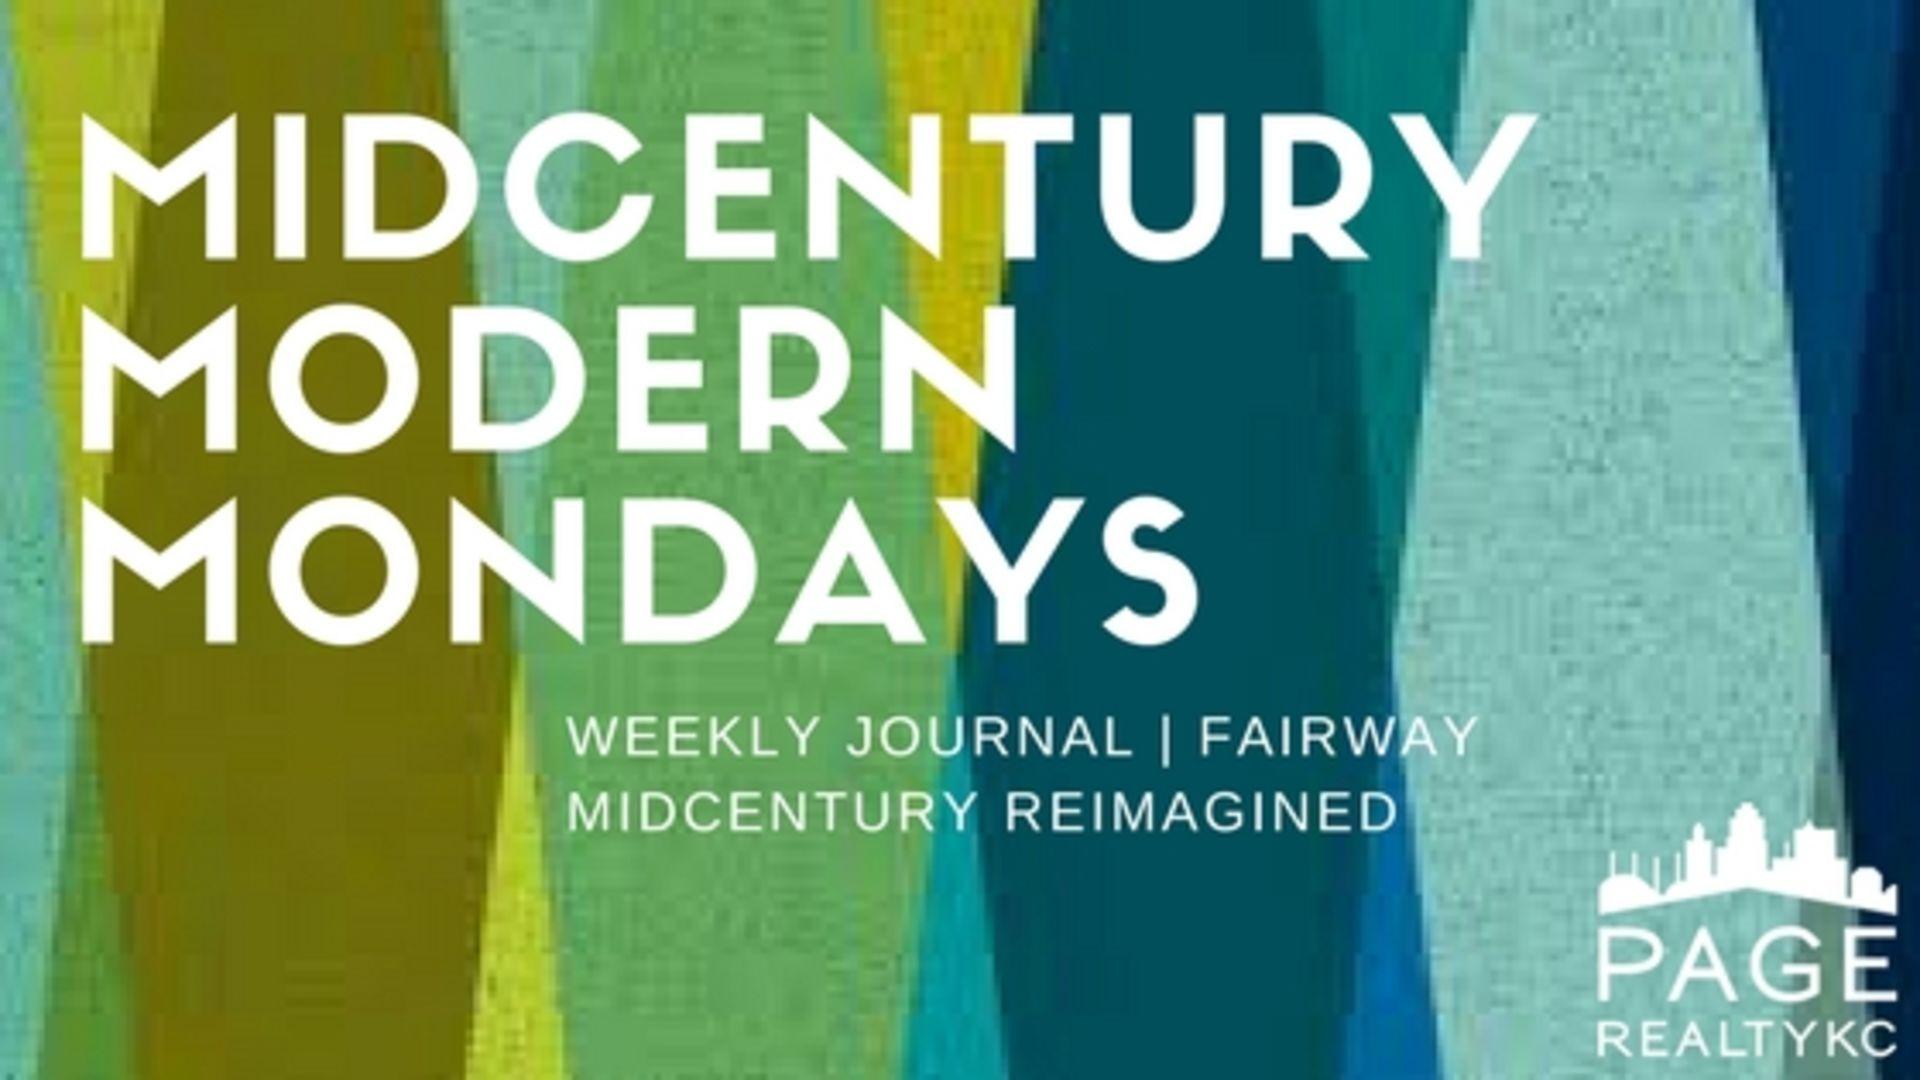 Midcentury Modern Monday – September 25th